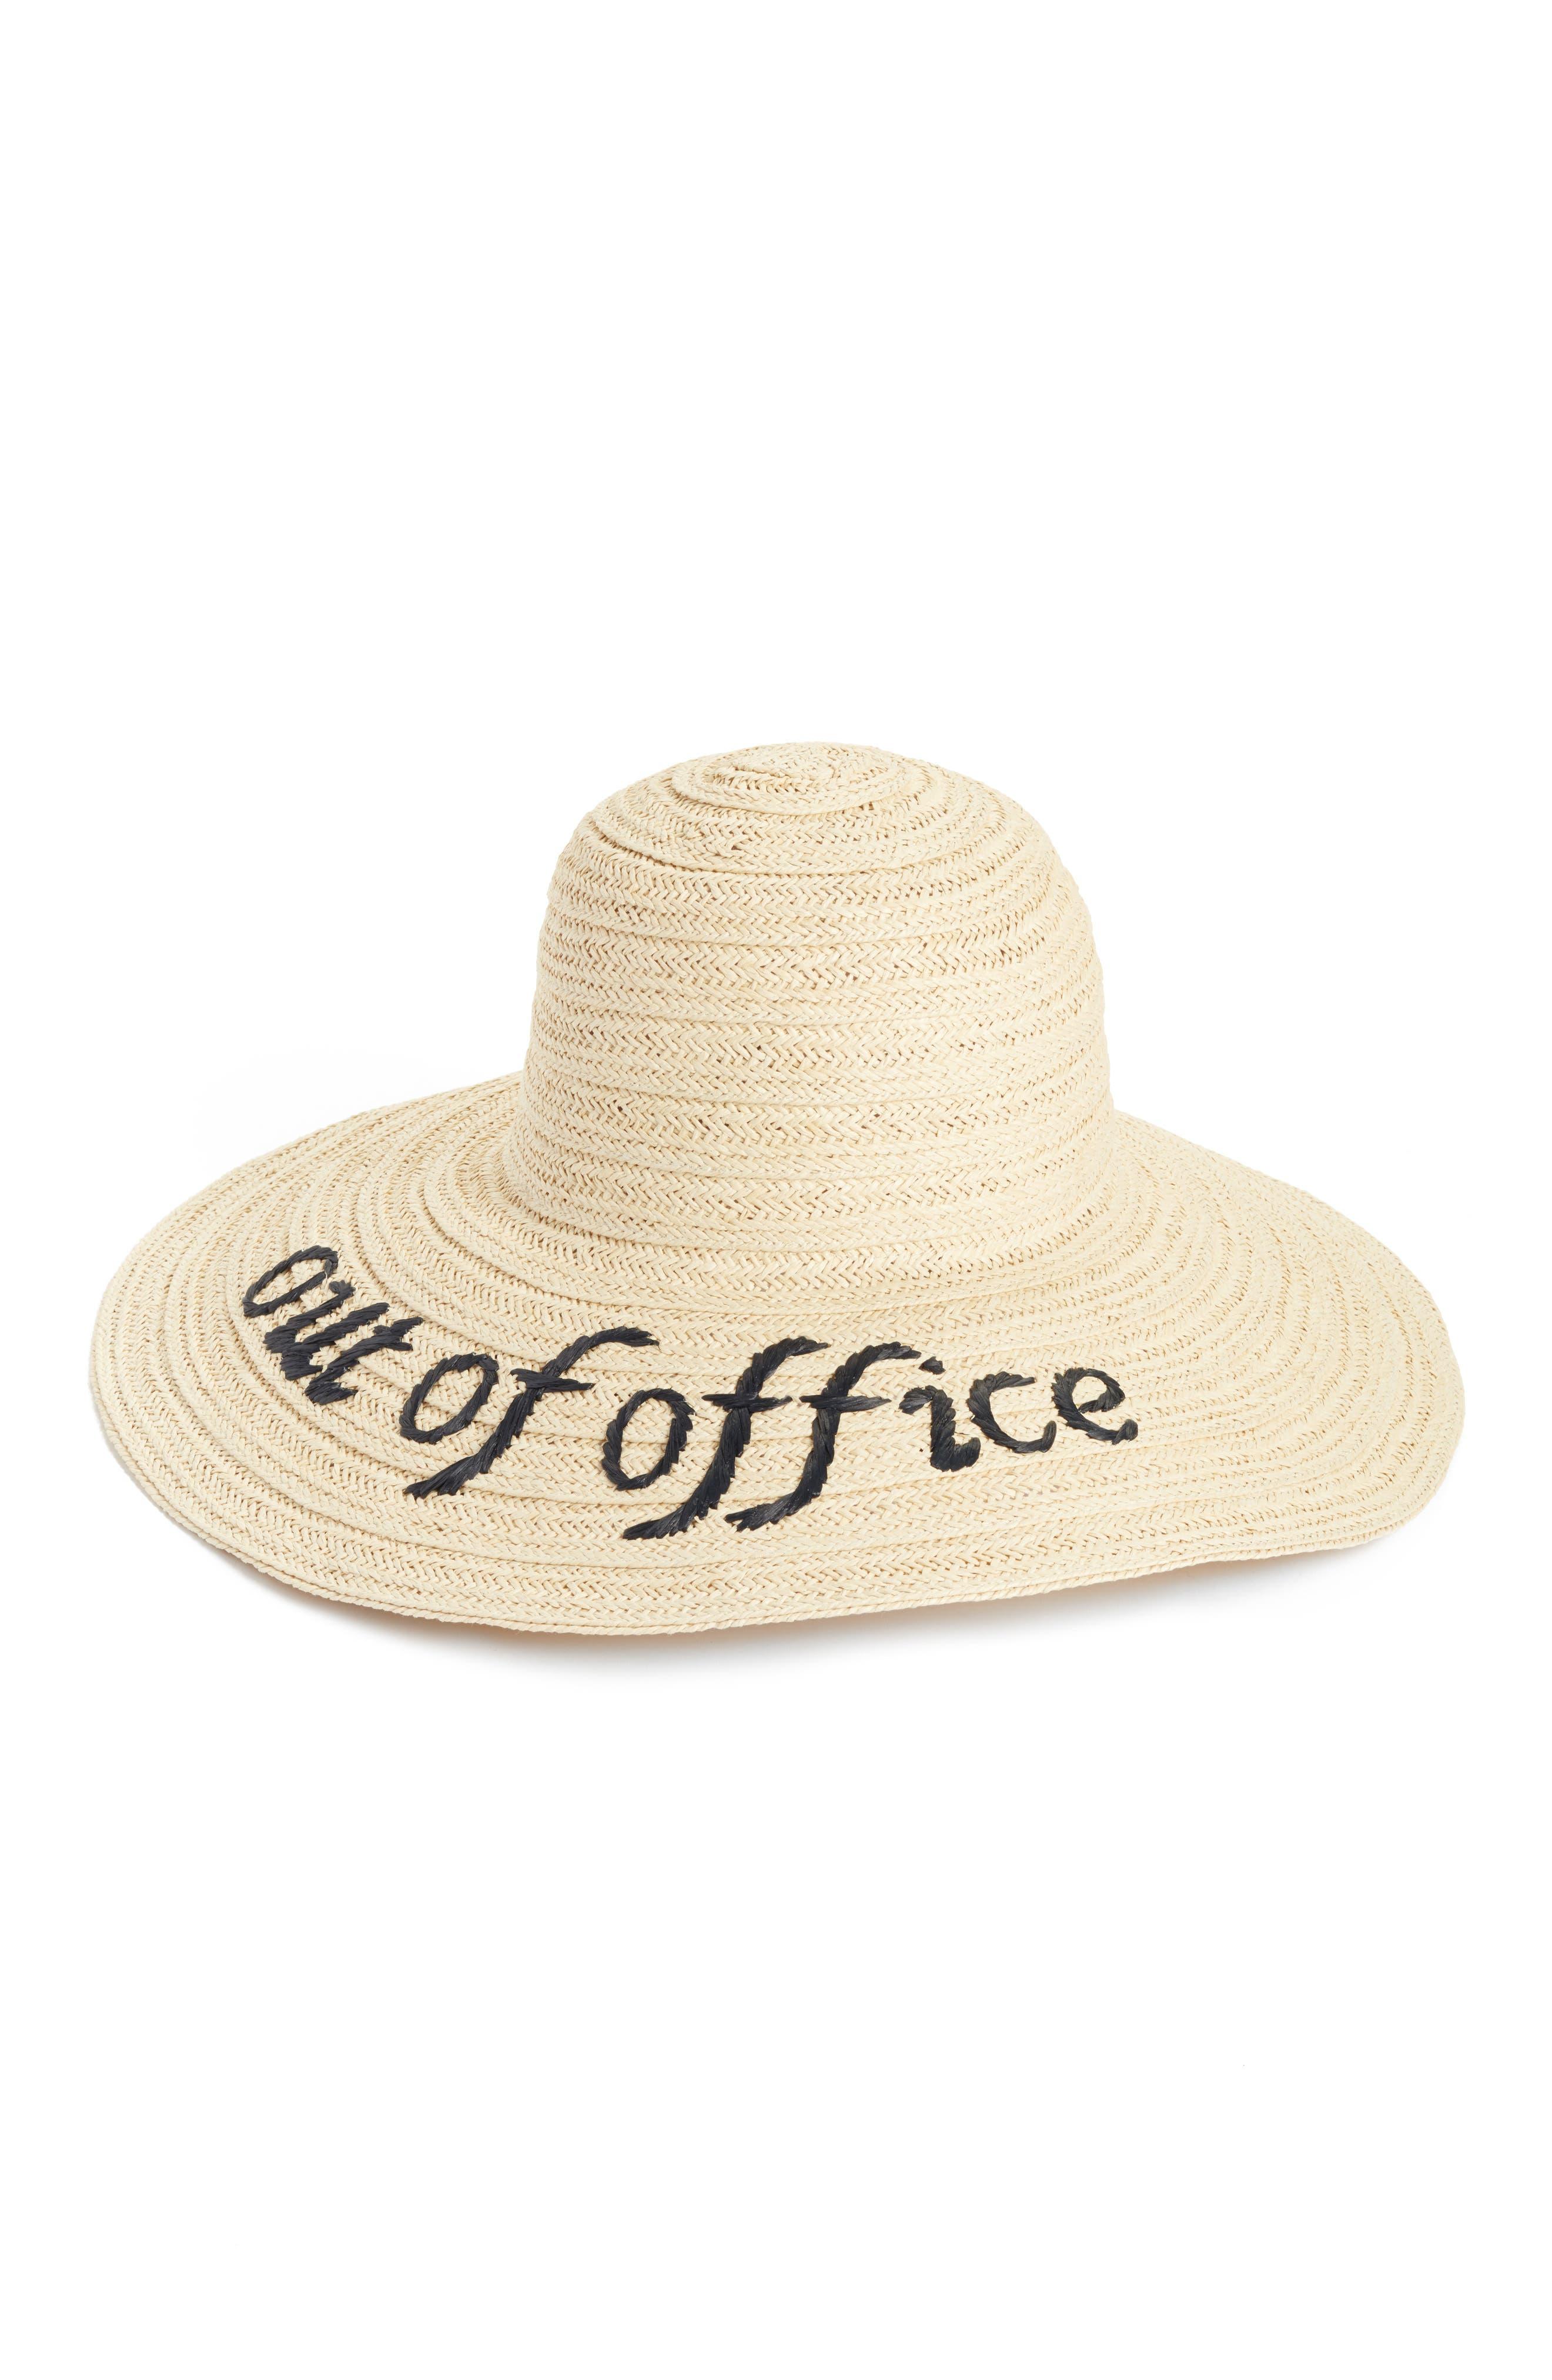 Wordplay Floppy Straw Sun Hat,                         Main,                         color,